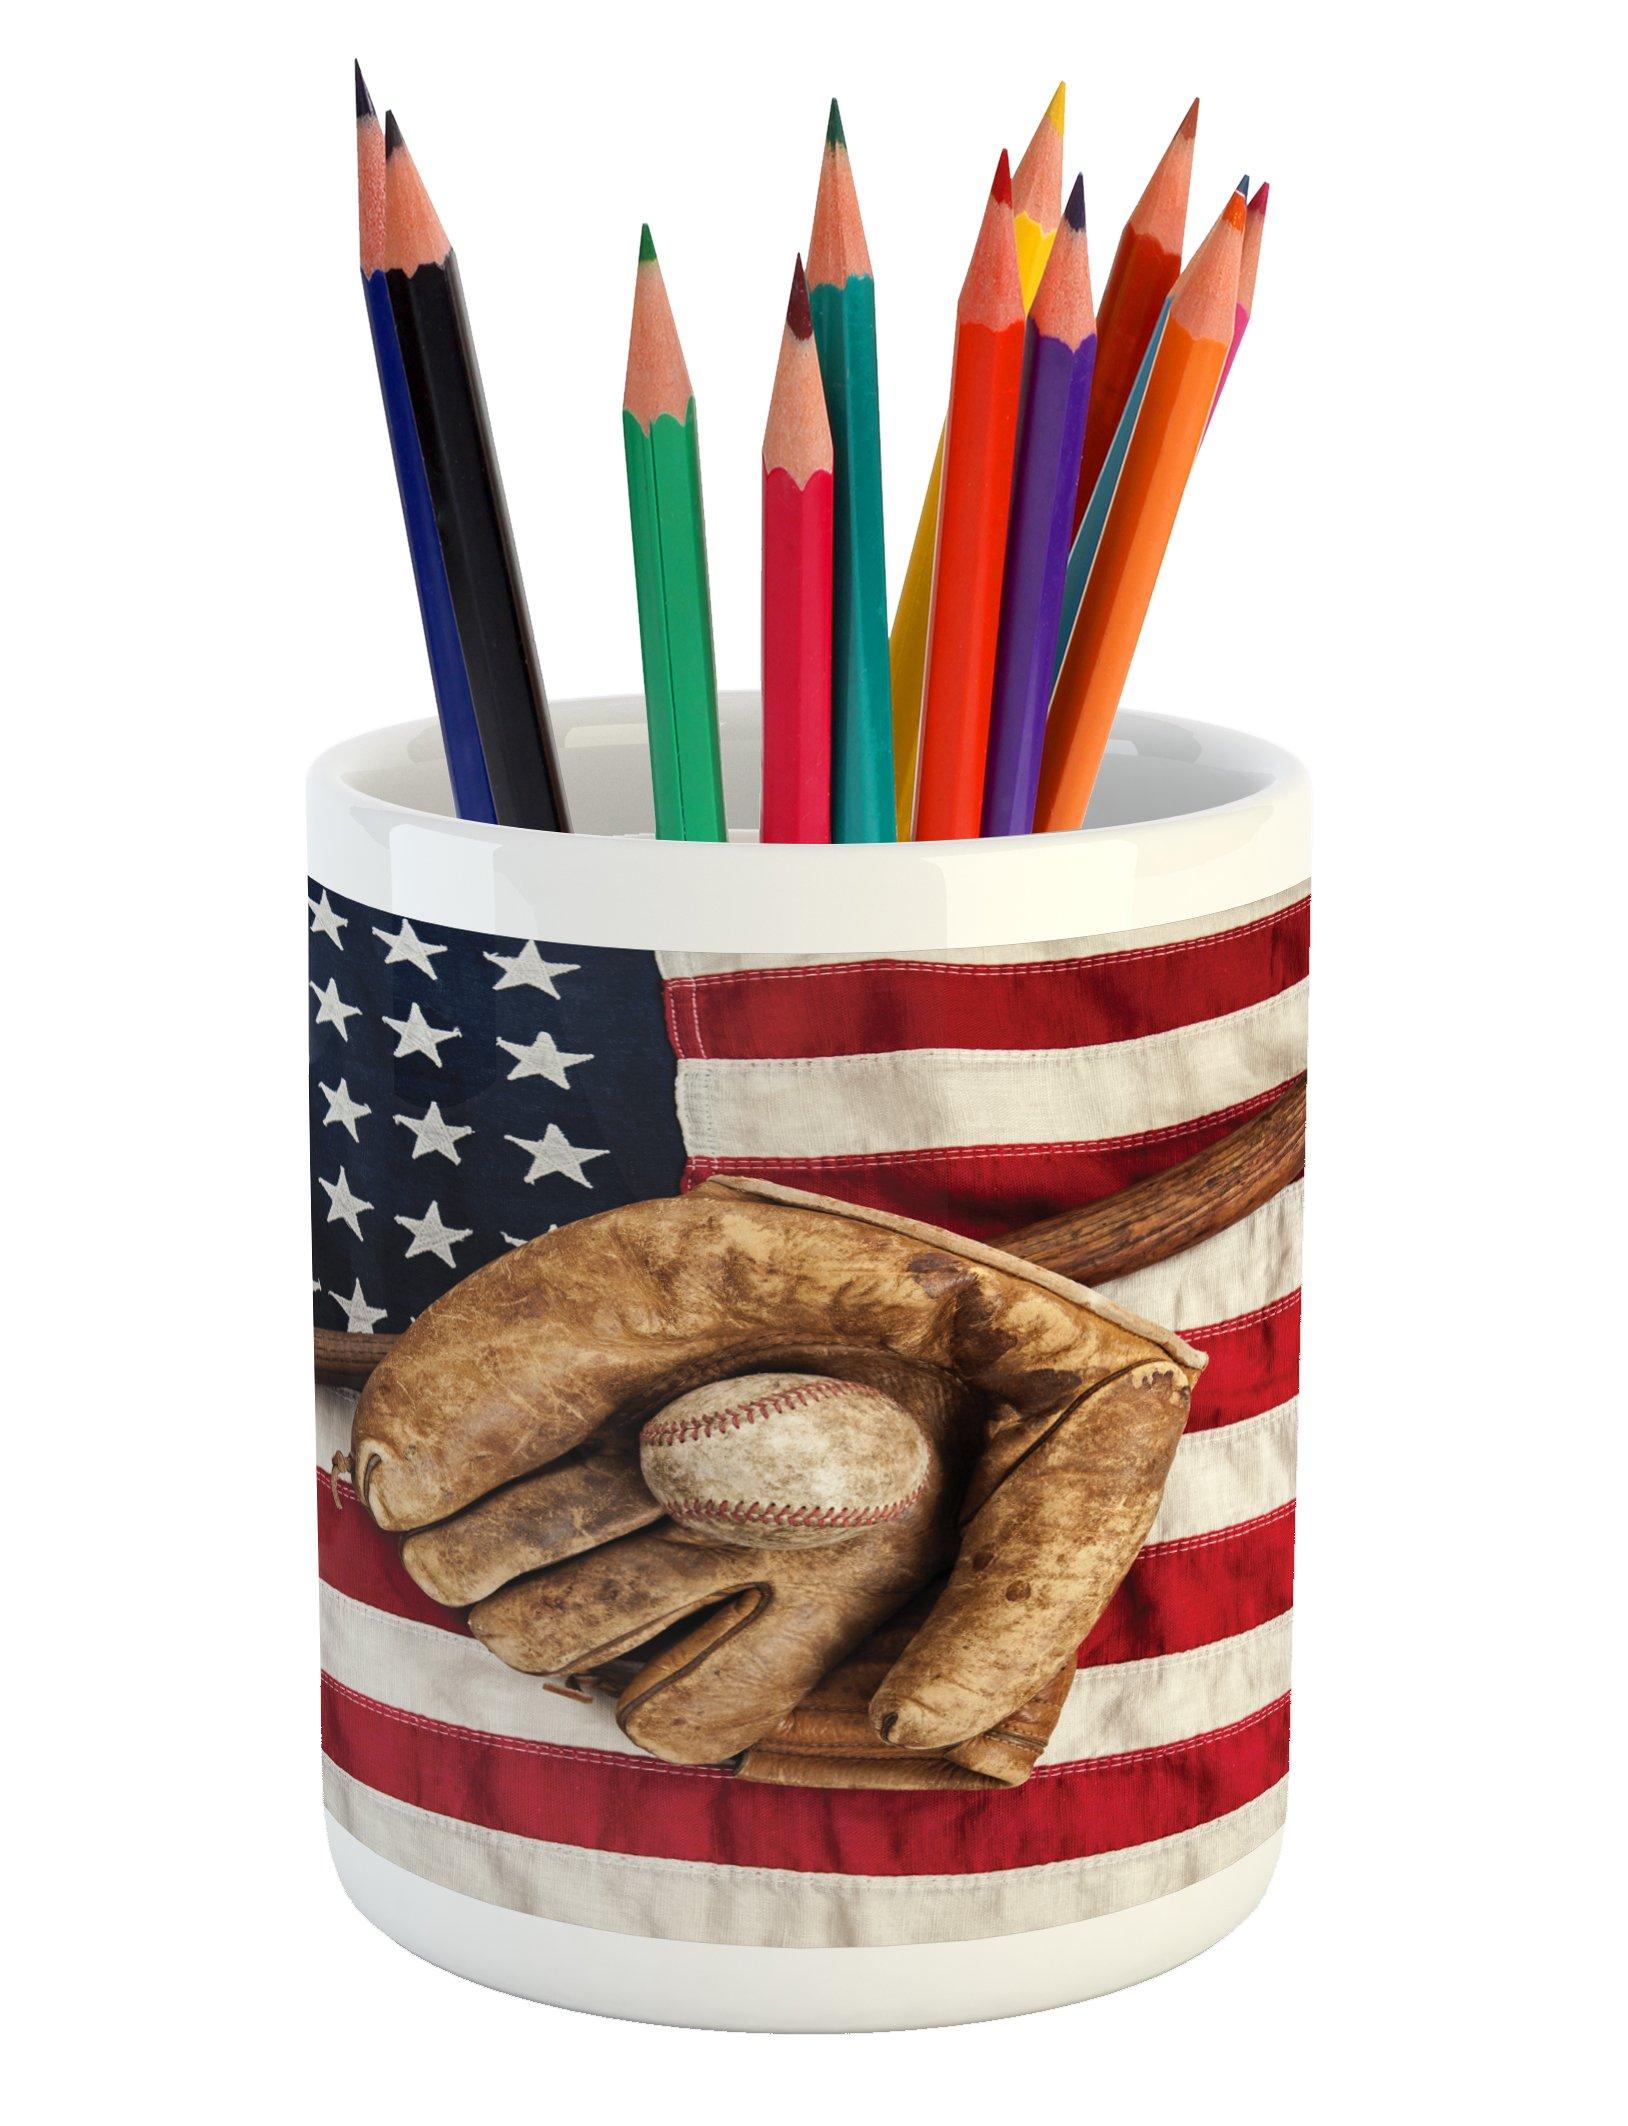 Ambesonne Baseball Pencil Pen Holder, Vintage Baseball League Equipment USA Grunge Glove Bat Fielding Sports Theme, Printed Ceramic Pencil Pen Holder for Desk Office Accessory, Brown Red Blue